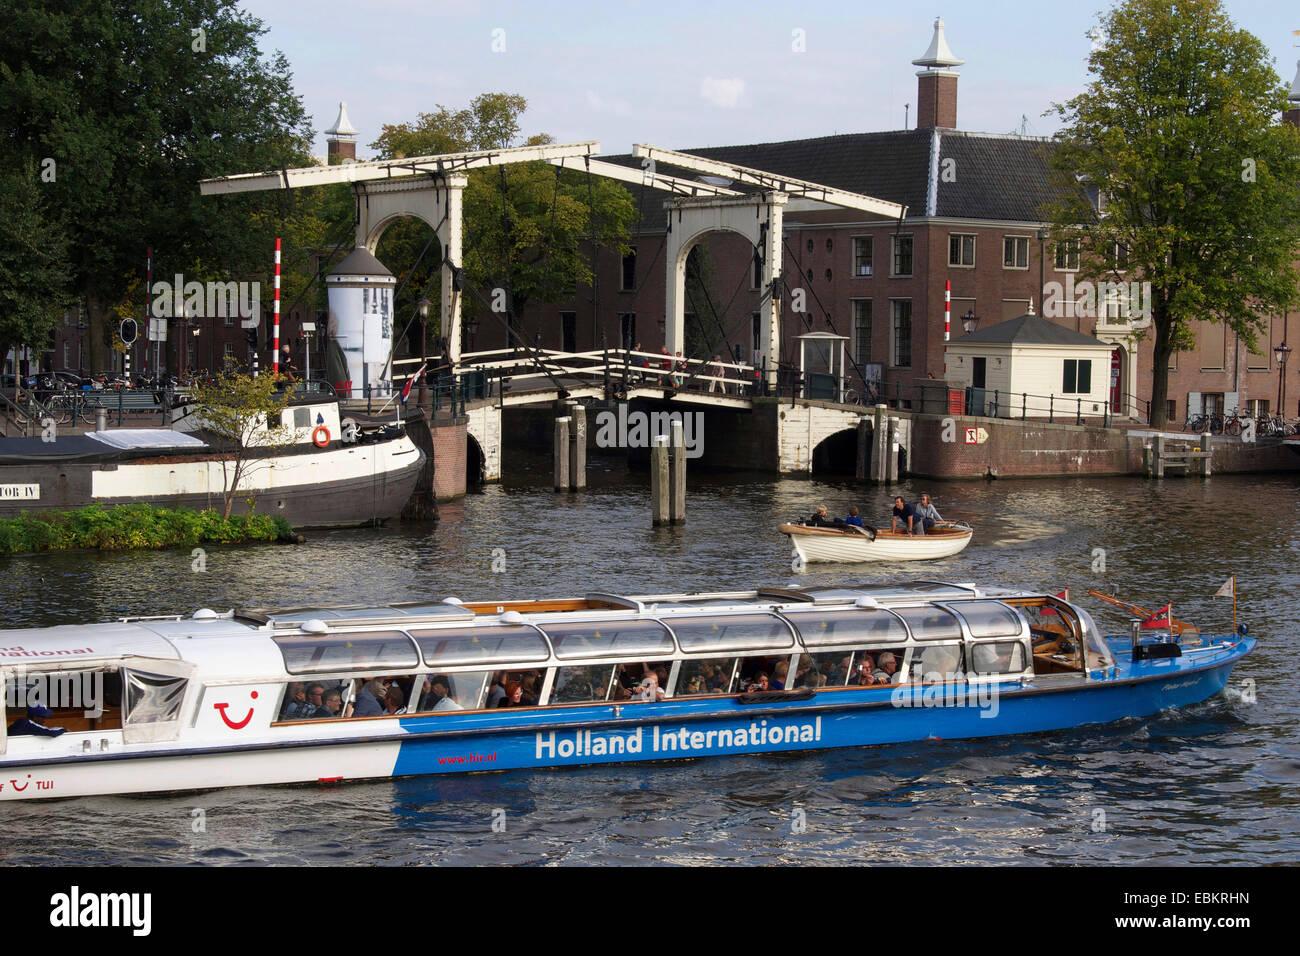 Wooden cantilever bridge along the Amstel River, Amsterdam, Netherlands, Europe - Stock Image